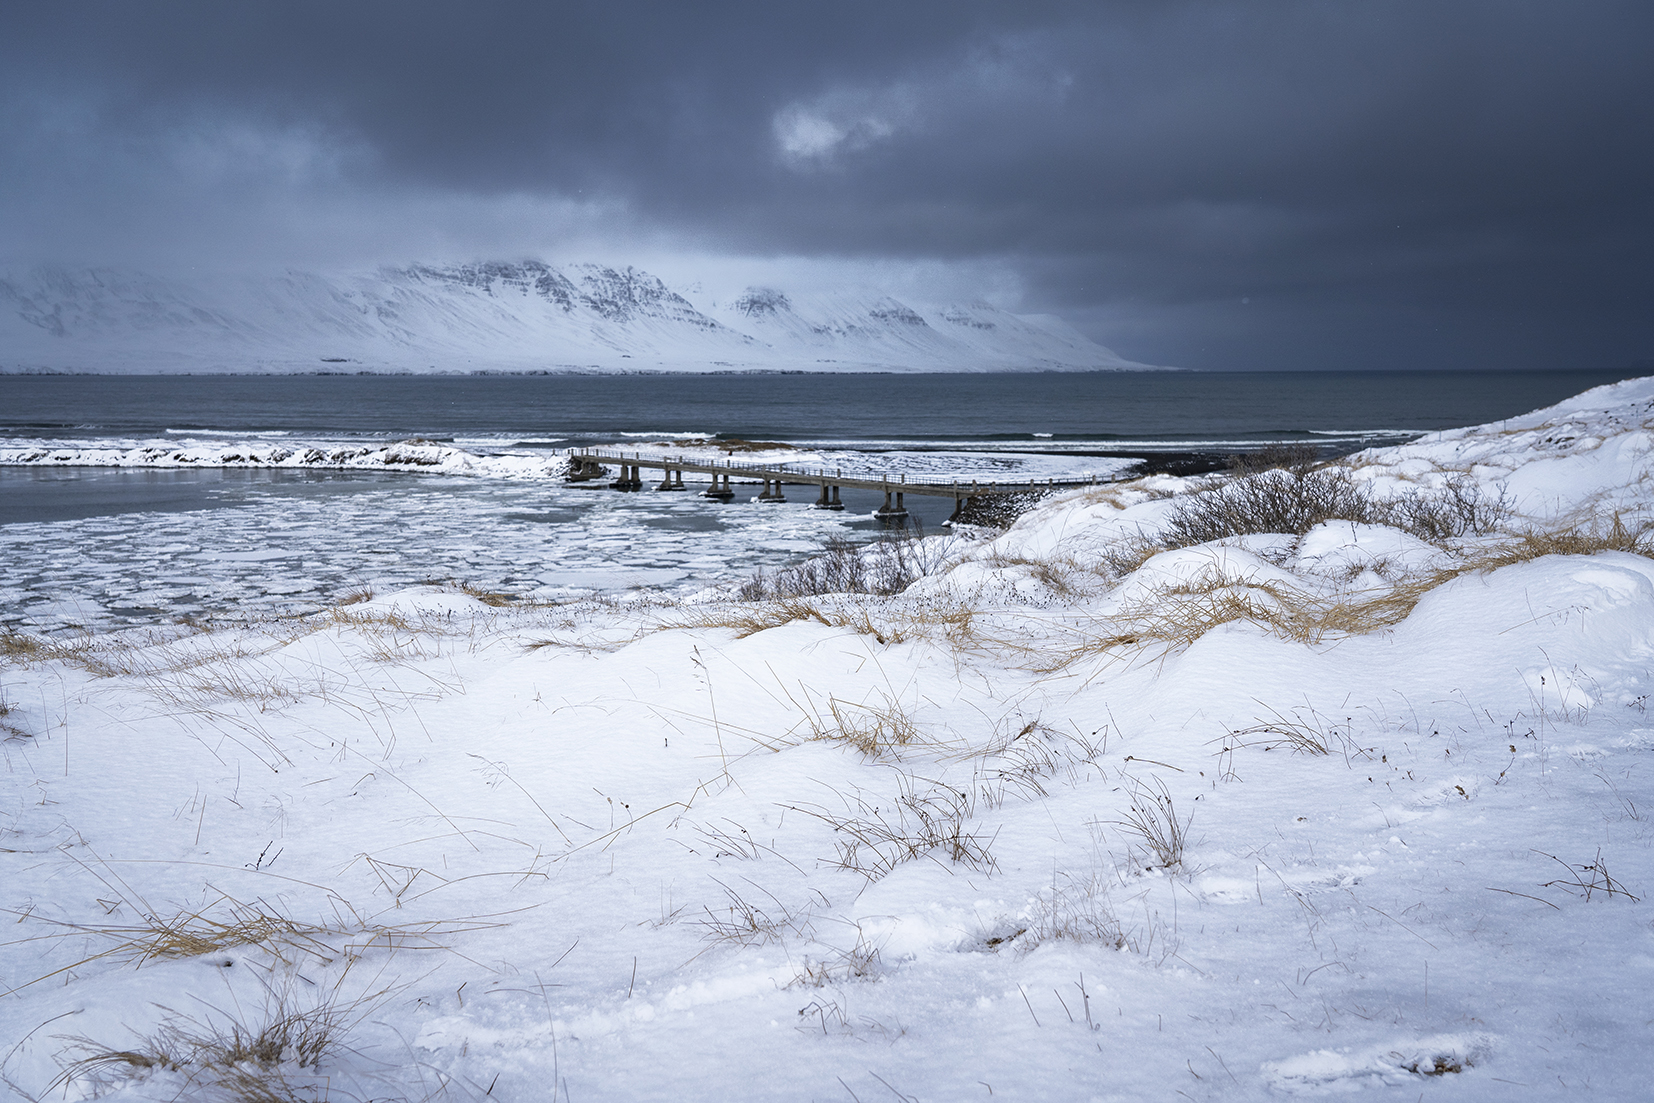 Islande Skagafjordur neuge ponton montagnes mer nuages gris